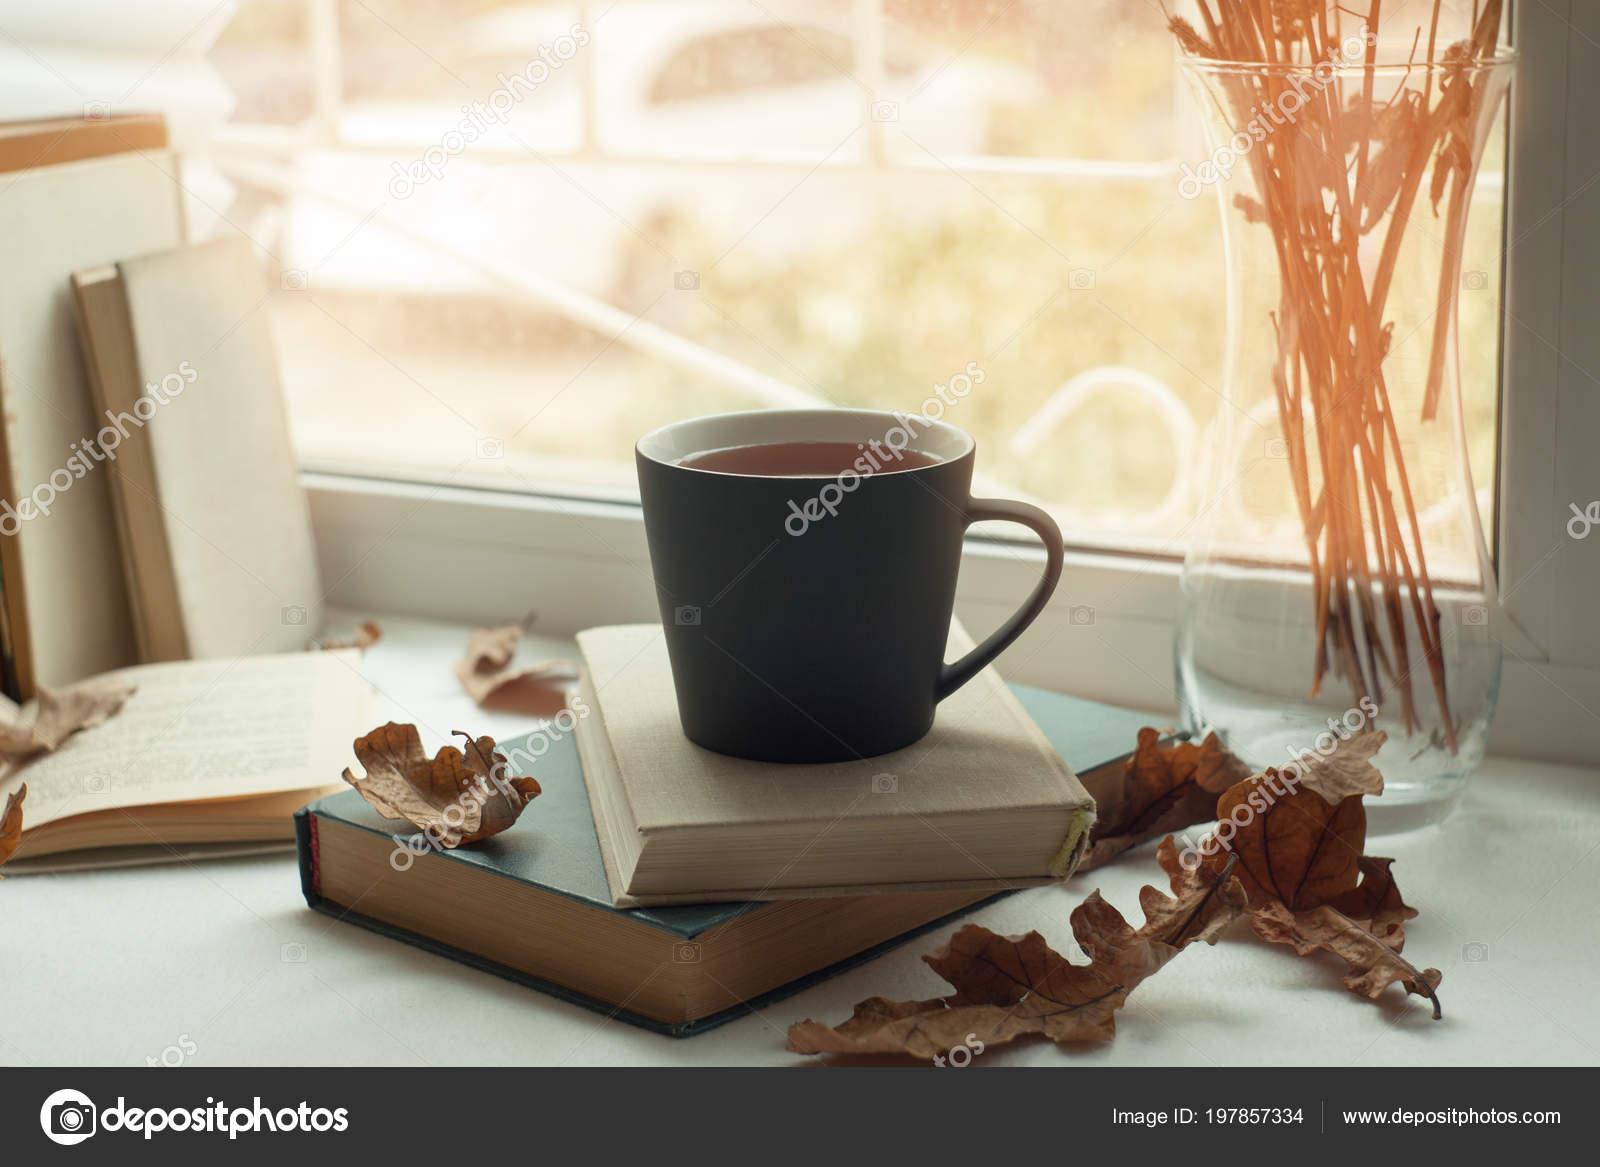 Cozy Window Autumn Leaves Book Mug Tea Time Read Autumn Stock Photo By C Misskaterina54 197857334 Wallpaper tea cup book garlands leaves